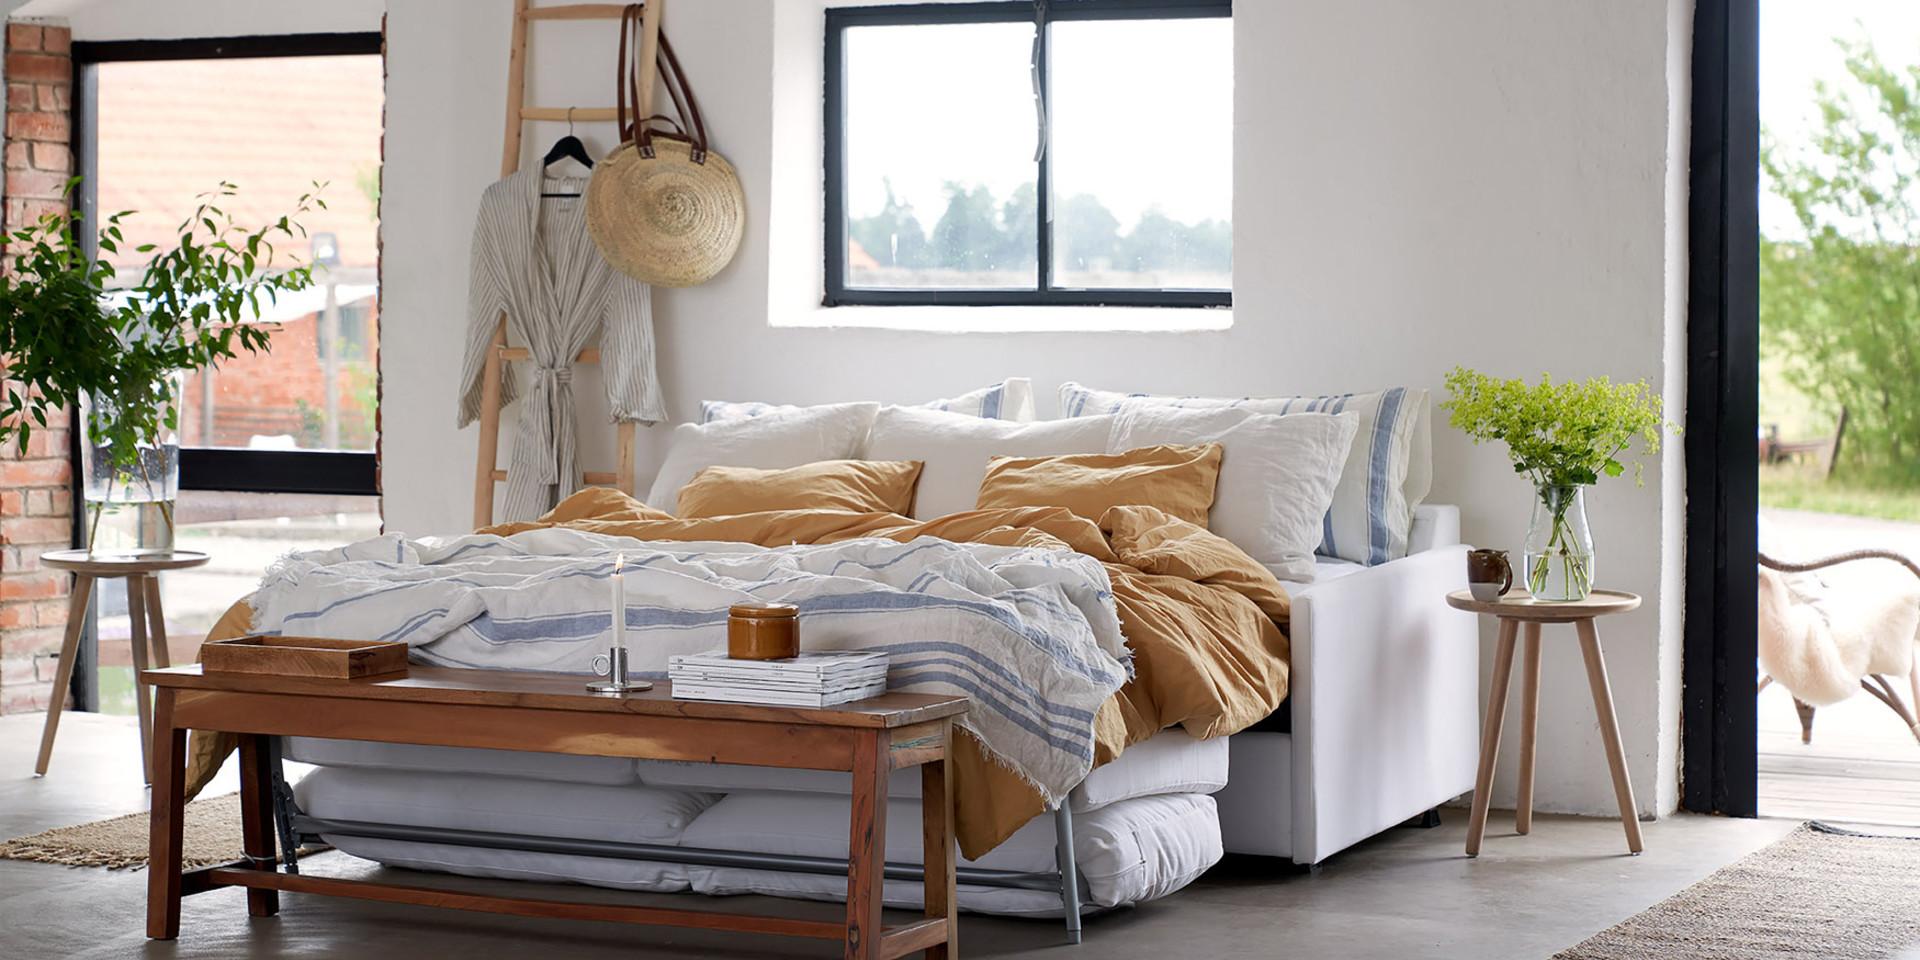 LUKAS_arrangement_sofa_bed4_caleido1420_white_4